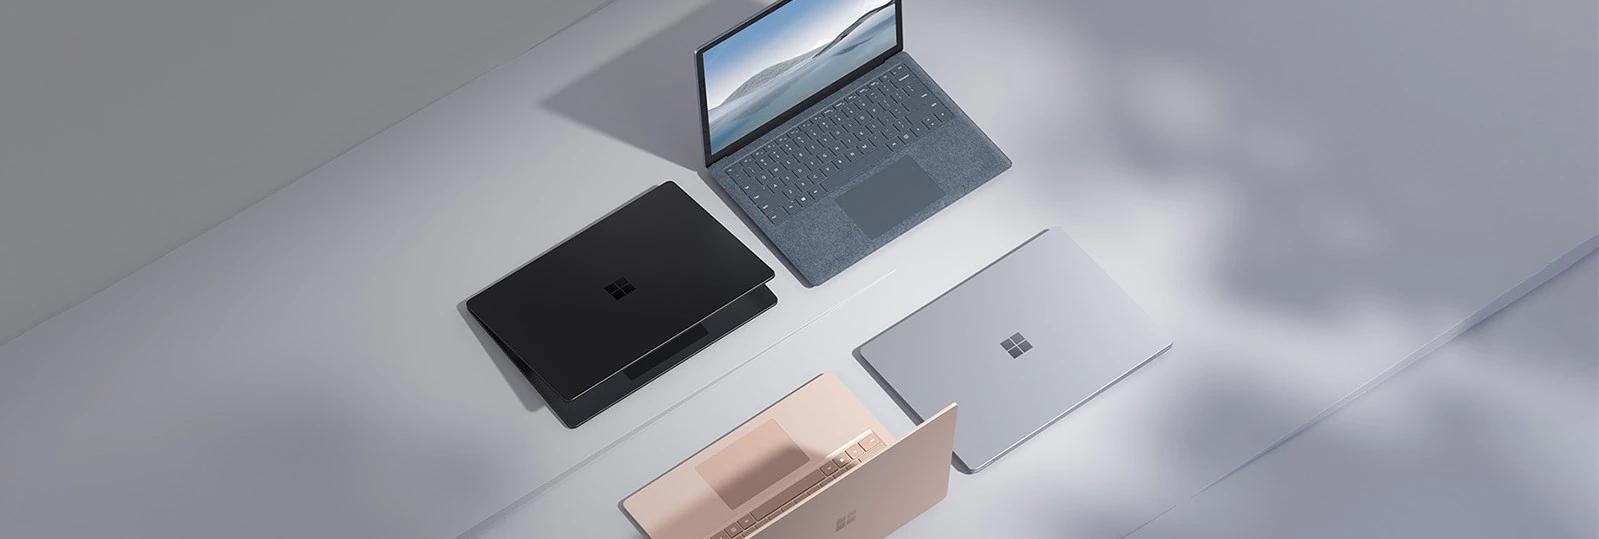 microsoft_surface_laptop_4